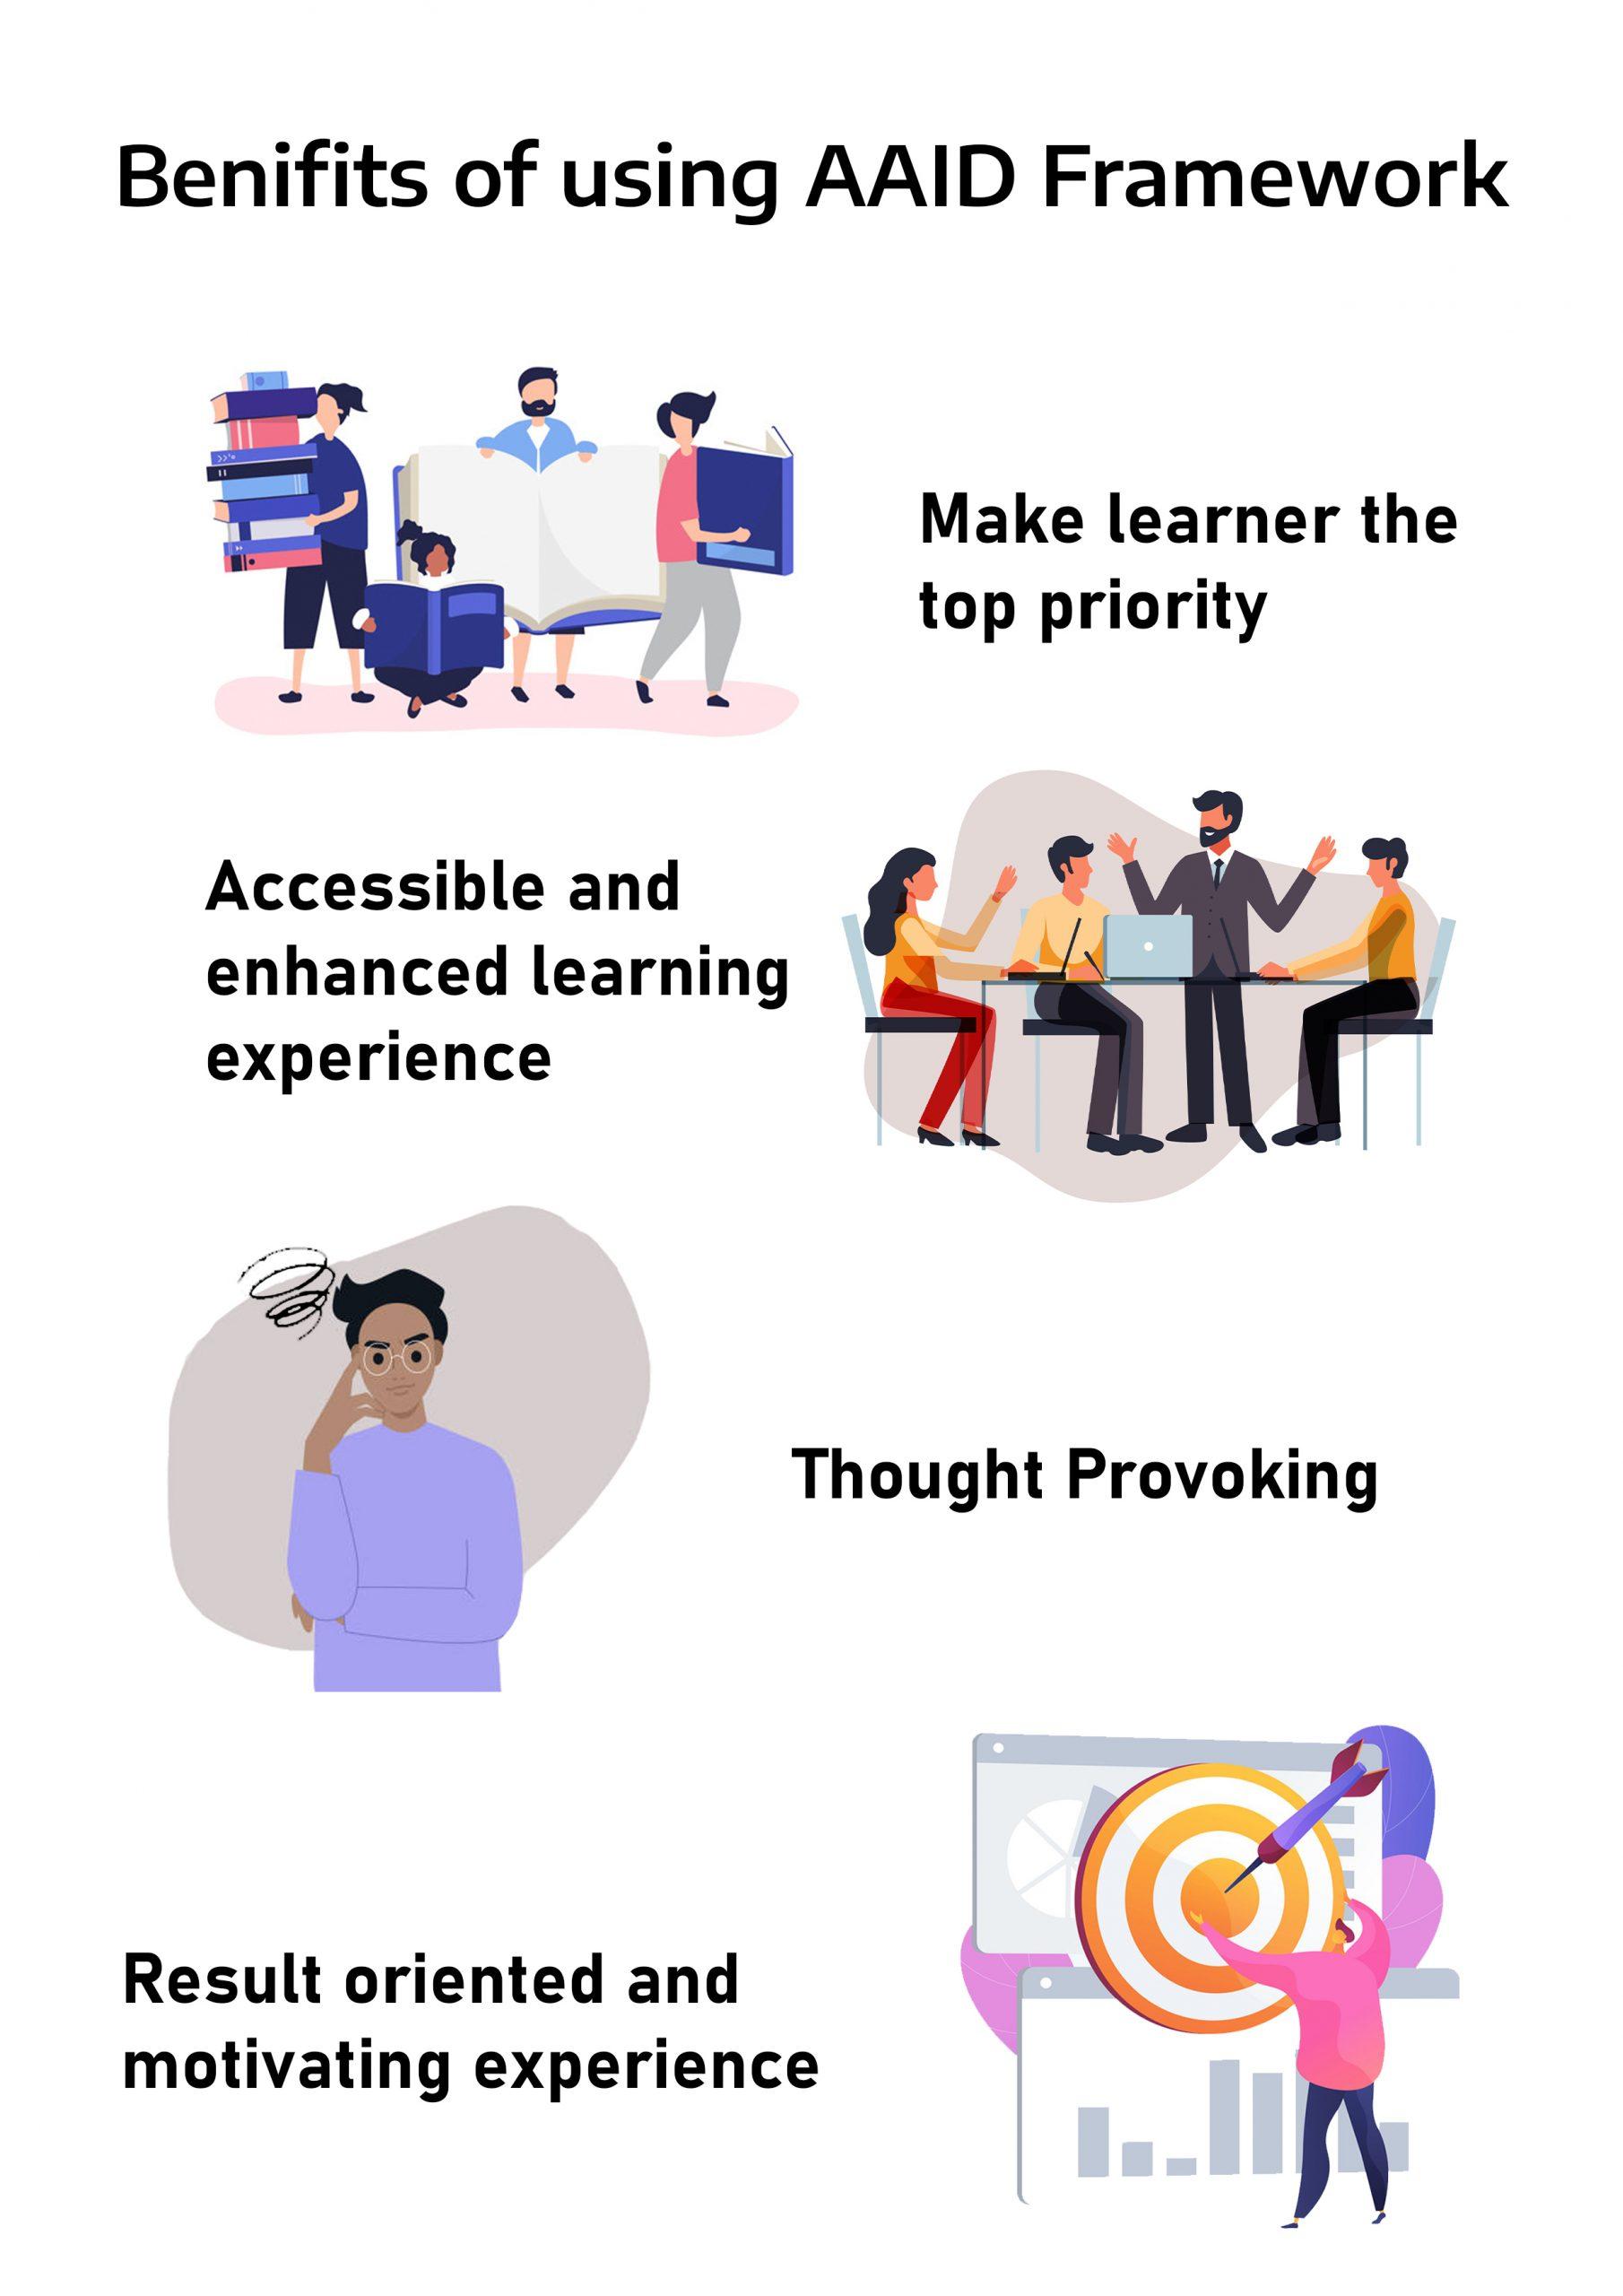 Benefits of AAID framework